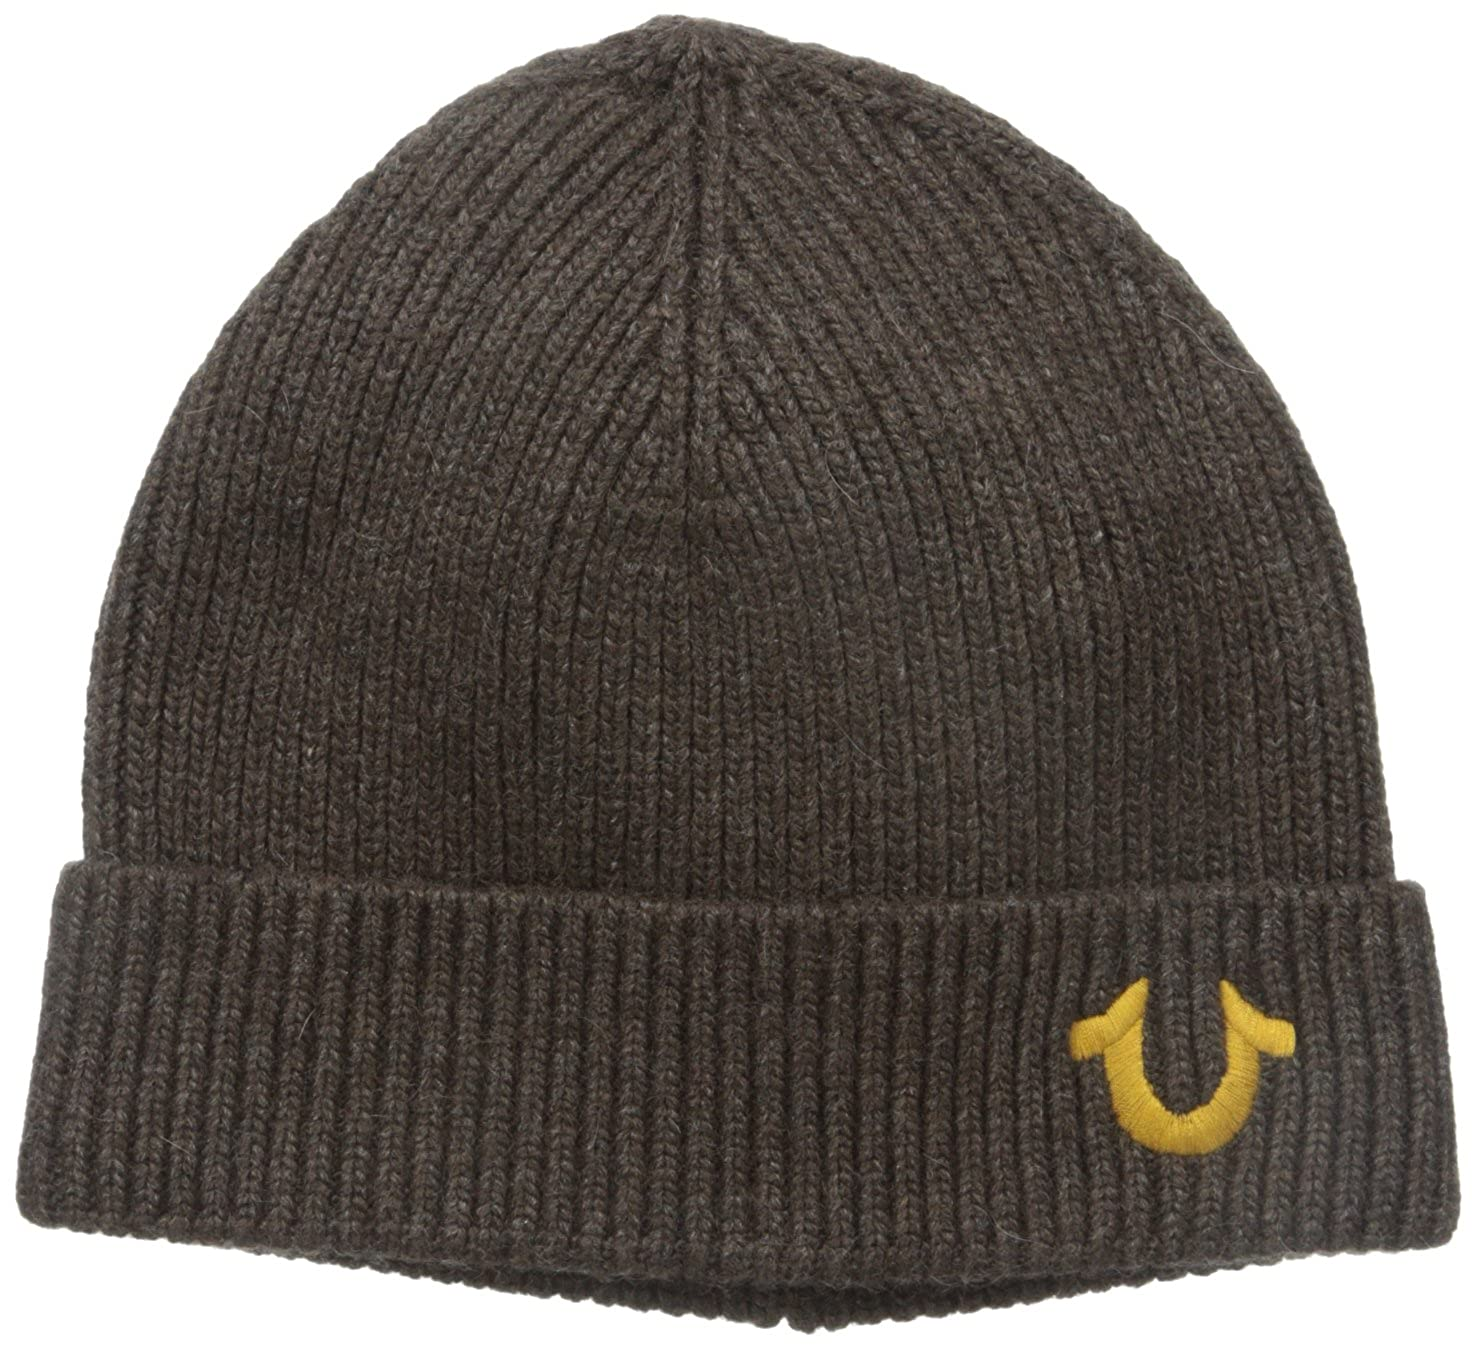 523c389d916 Amazon.com  True Religion Men s Ribbed Knit Watchcap